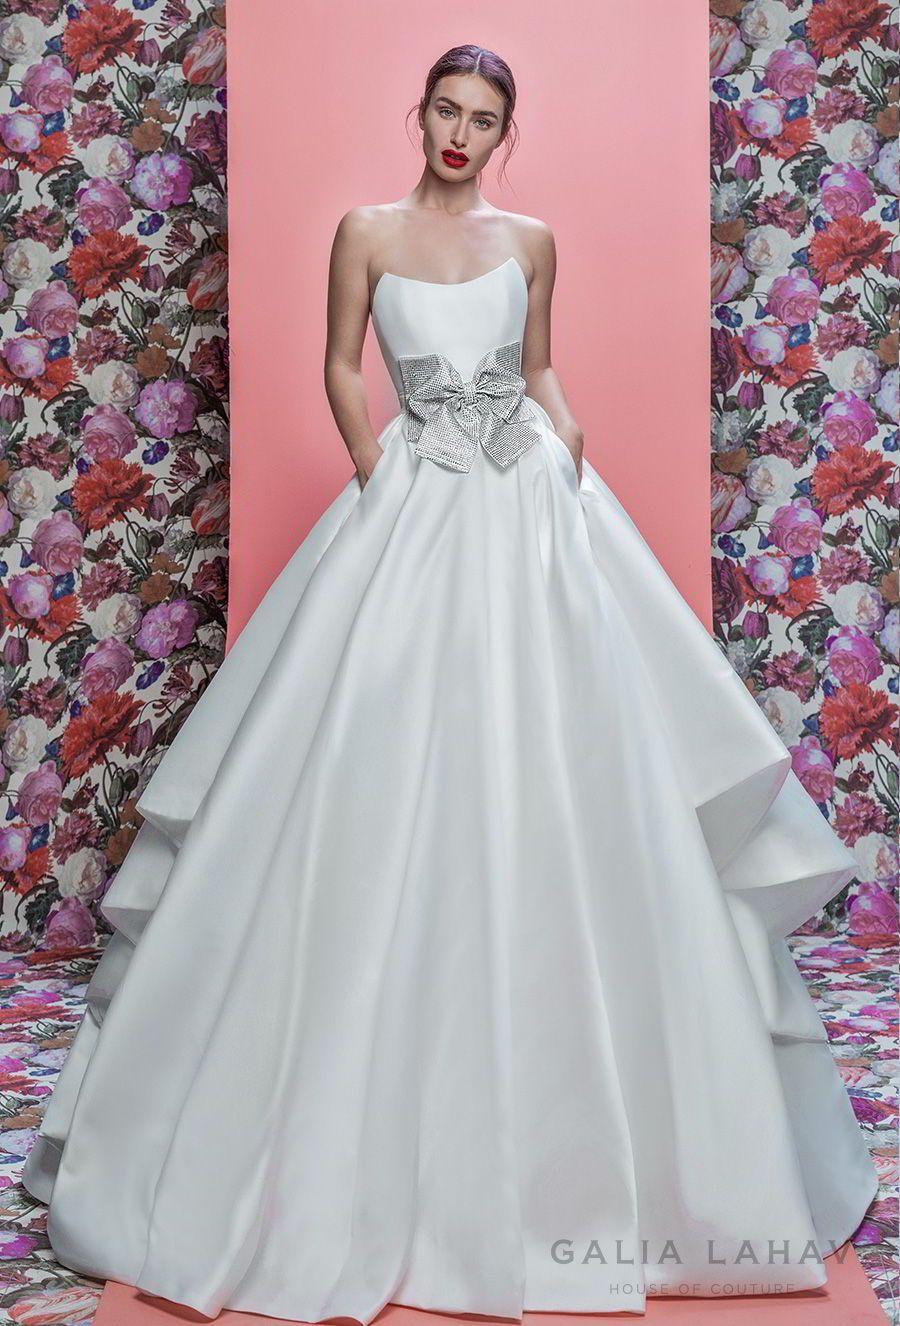 Galia lahav spring ucqueen of heartsud bridal collection u all